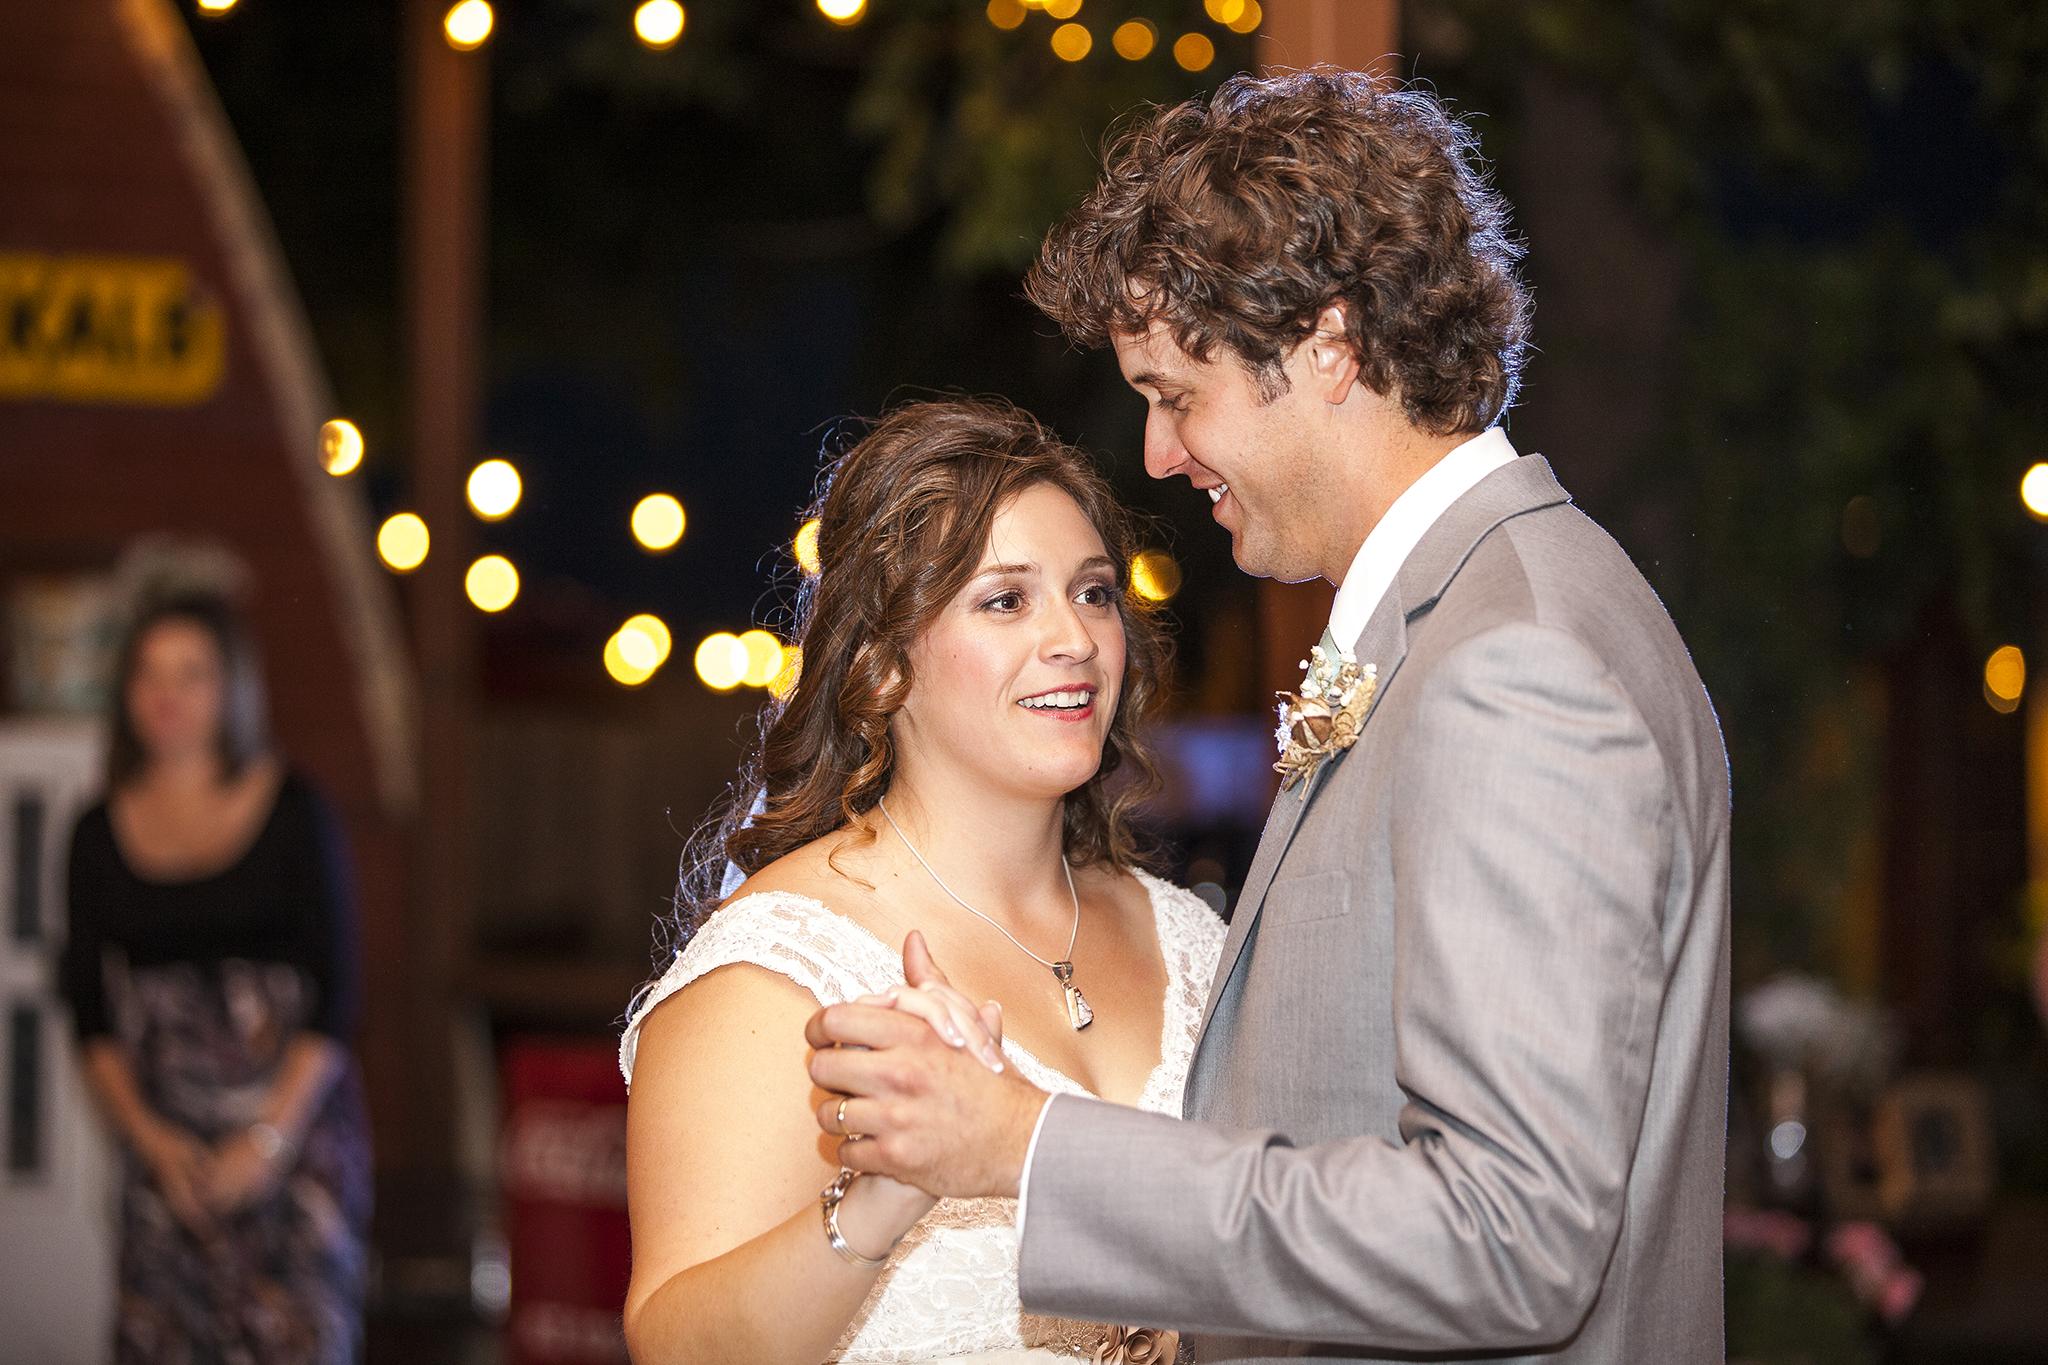 Lubbock Wedding Photography Wedding Photographer Walnut Tree Bride and Groom Dancing